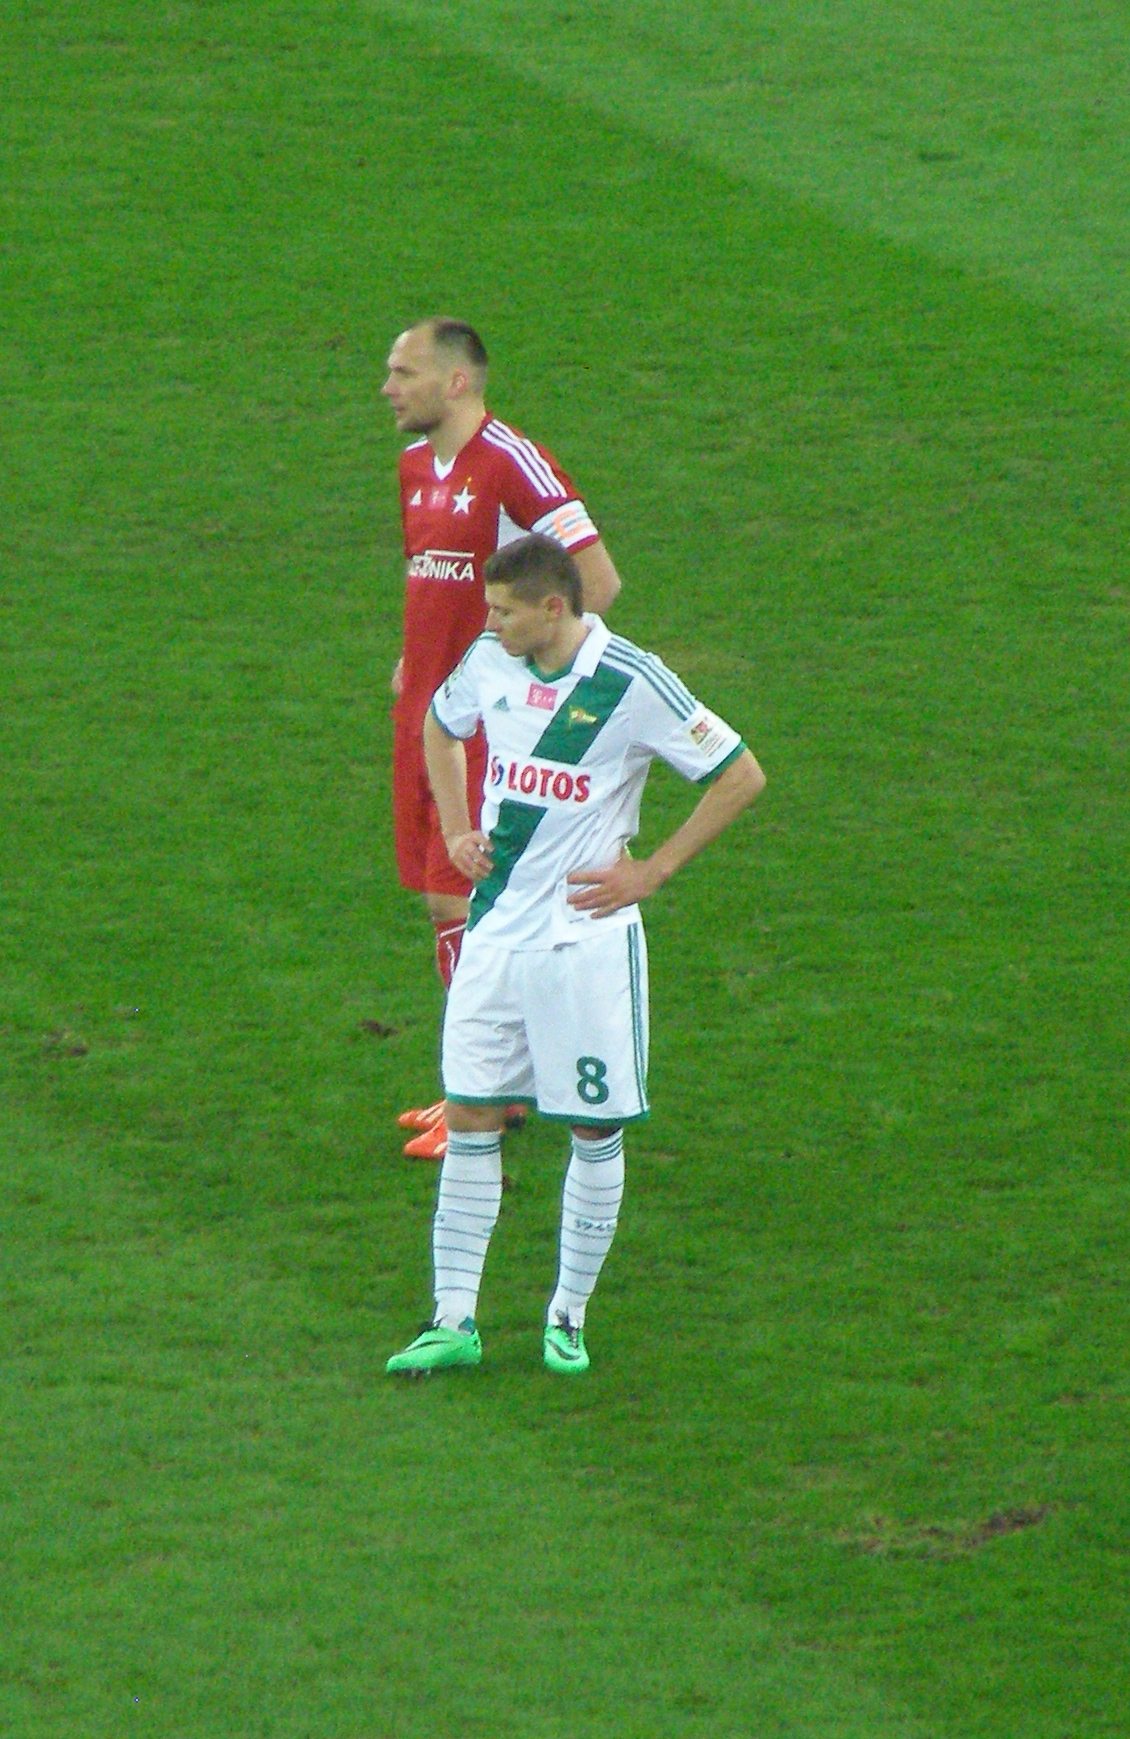 File:Gdansk PGE Arena Lechia-Wisla 7.jpg - Wikimedia Commons